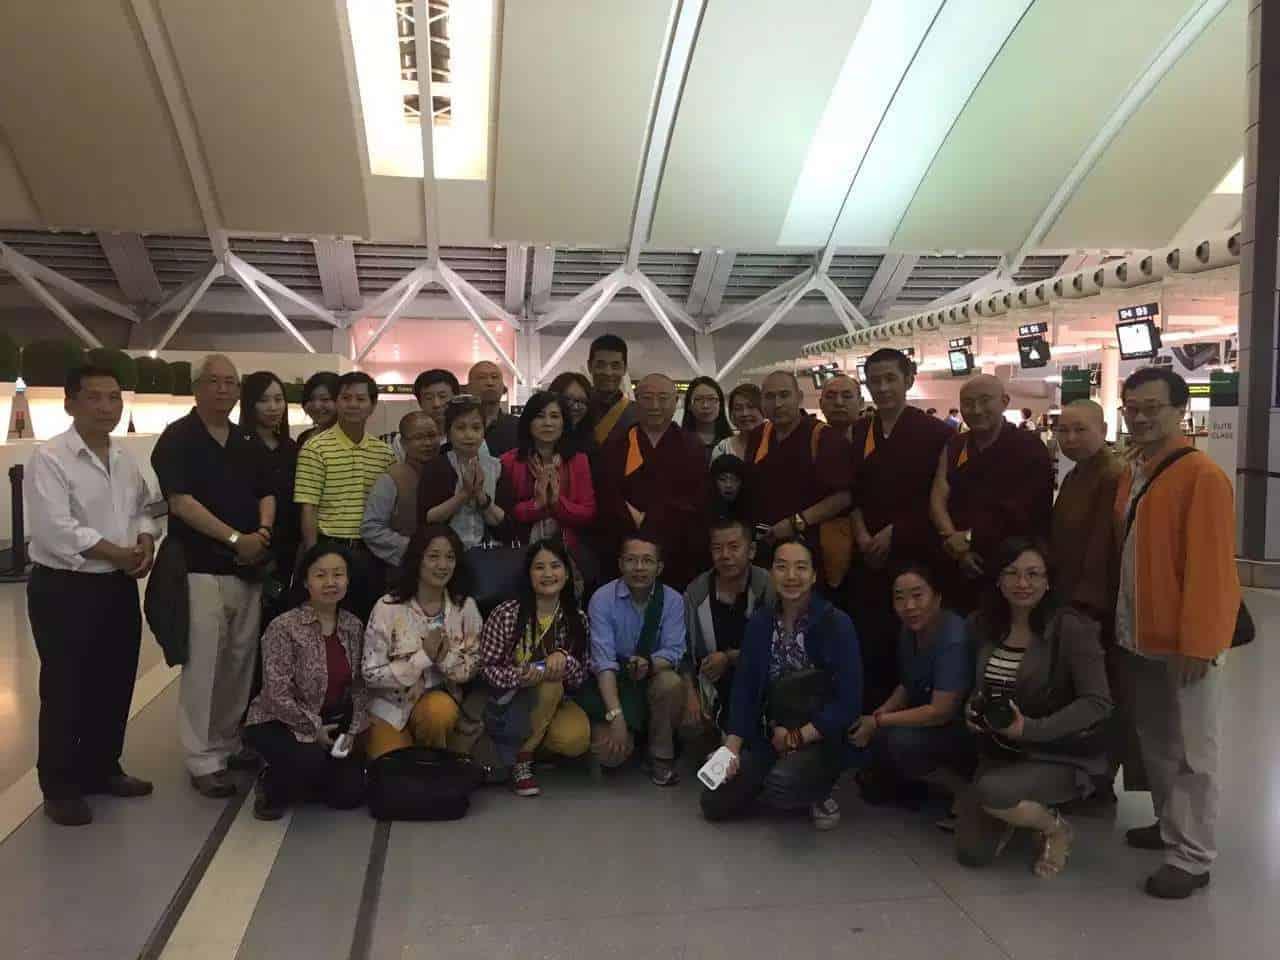 gosok-rinpoche-toronto-2016-bc116fd2d3b9d135d188b953349c319